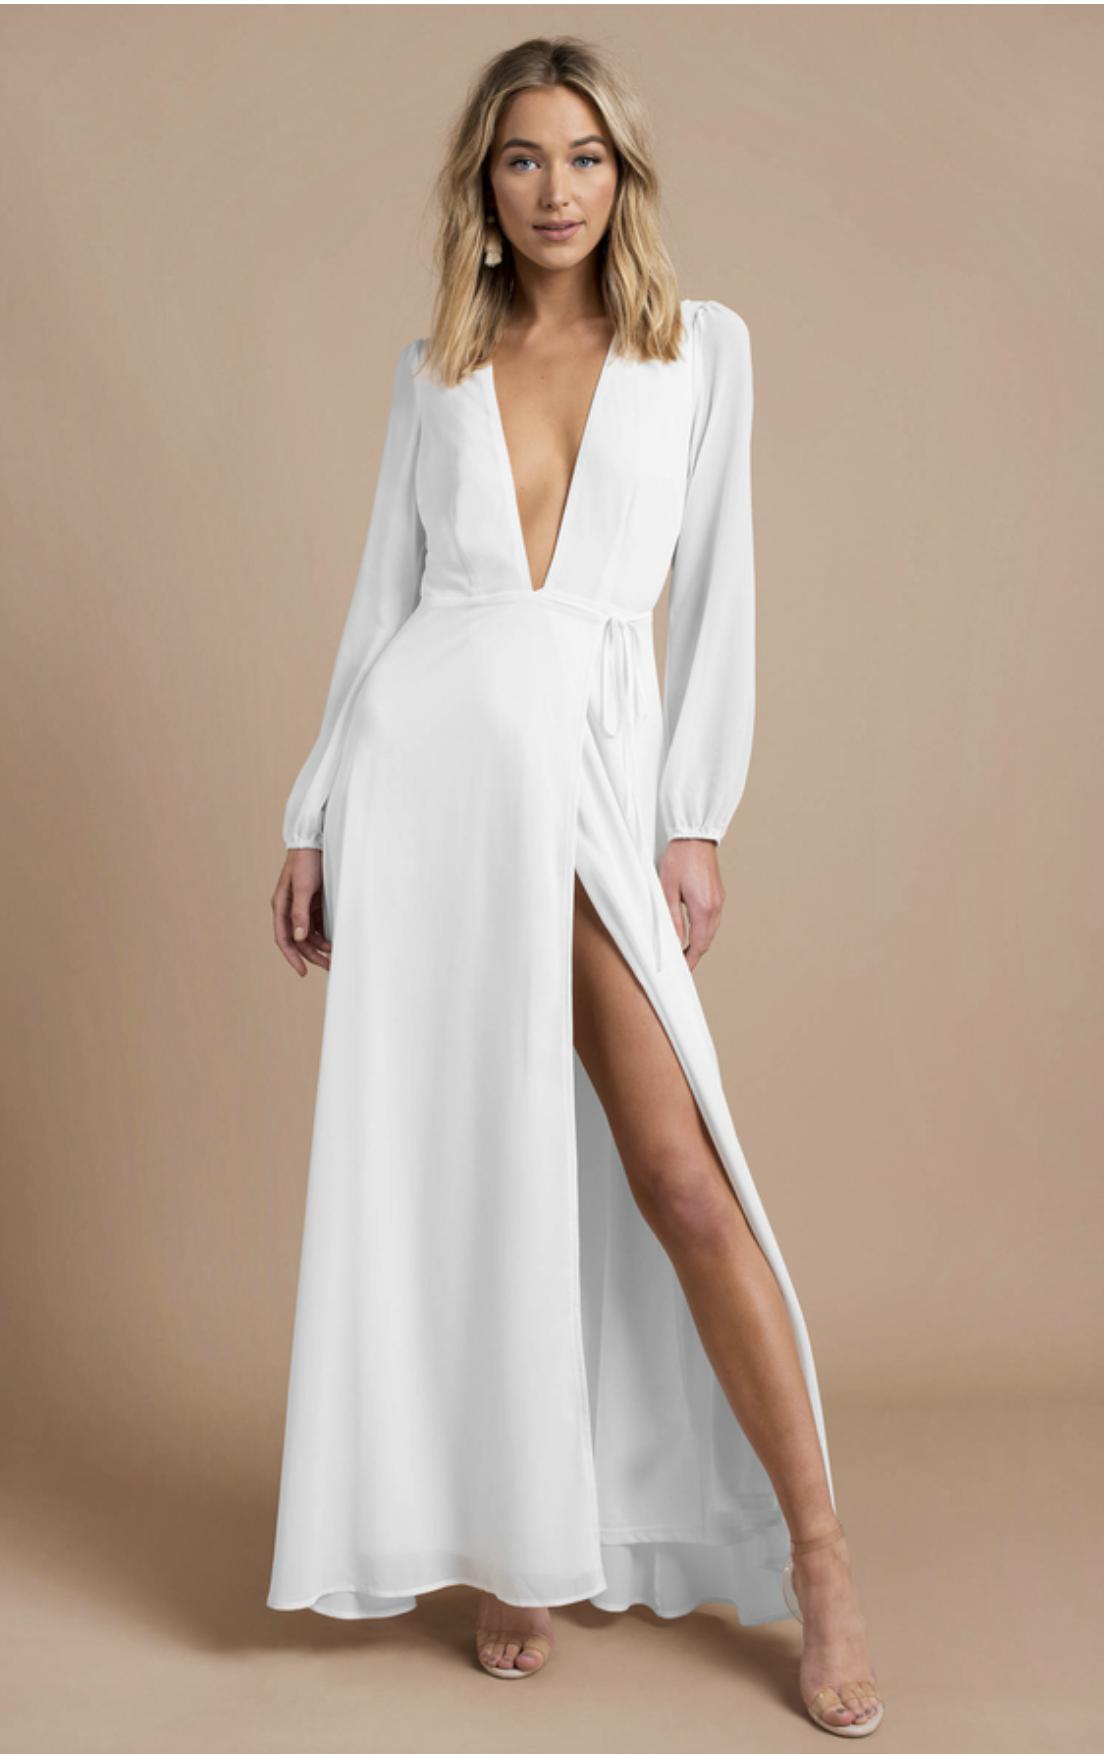 Cherish Me Ivory Plunging Maxi Dress - $46